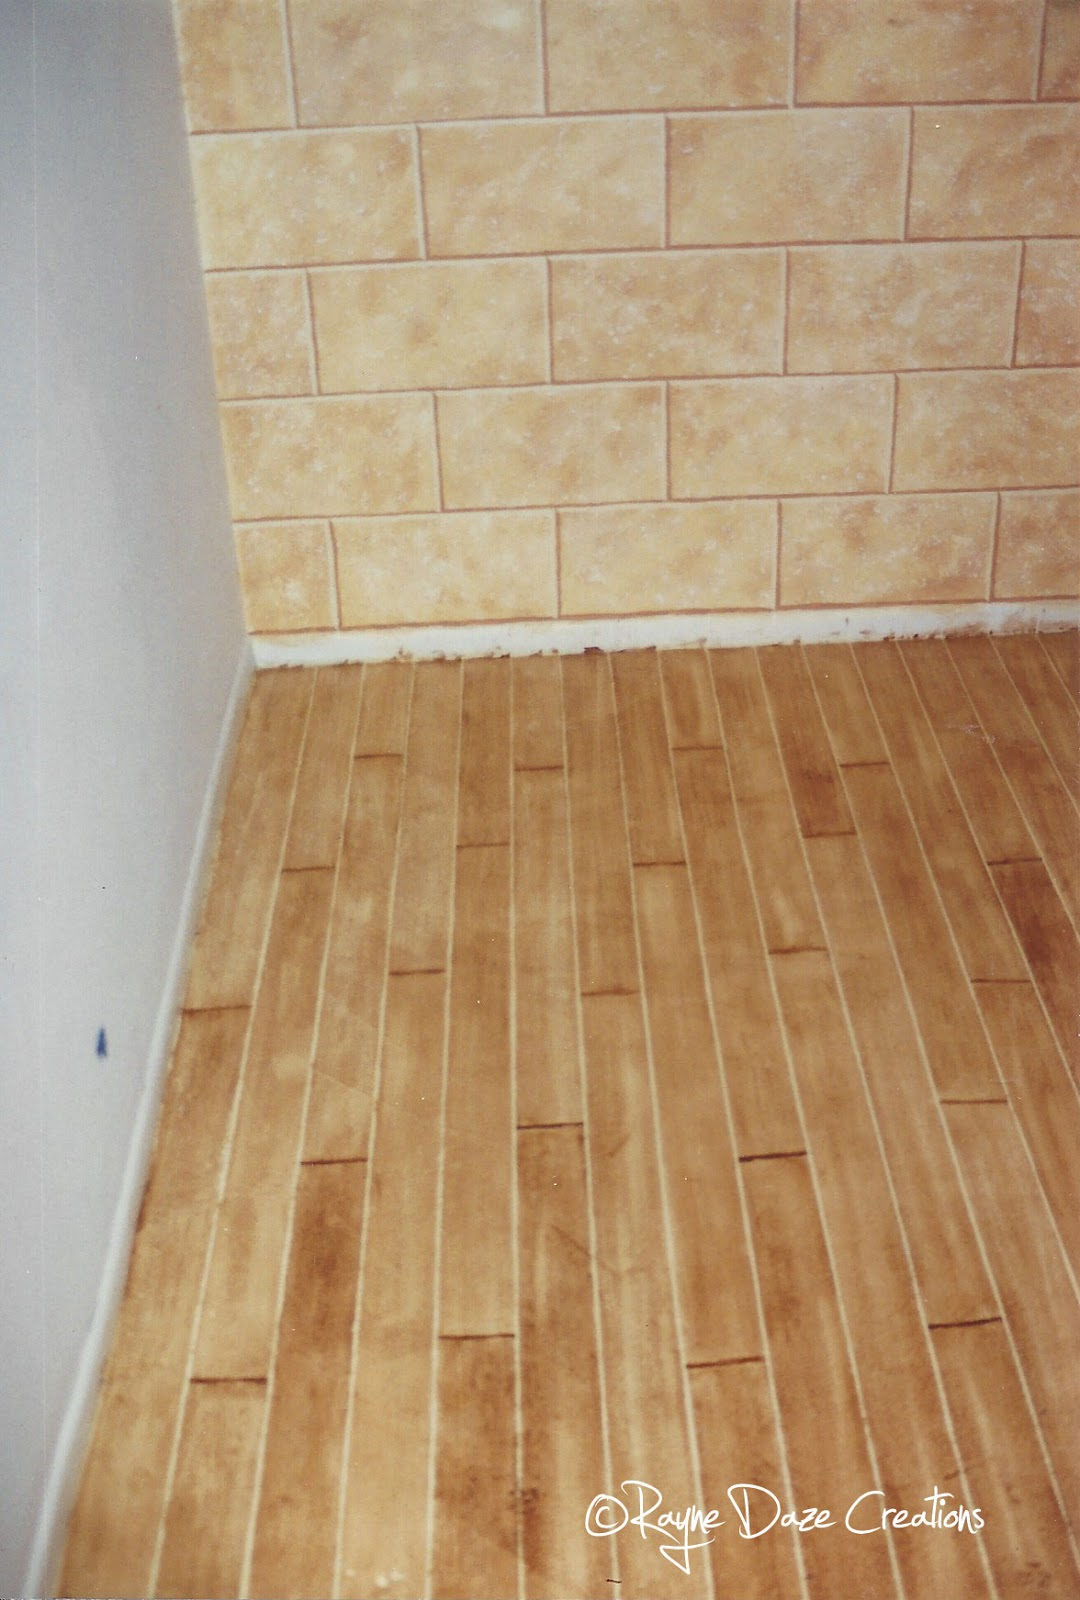 Rayne Daze Creations Faux Wood Painted Concrete Floor